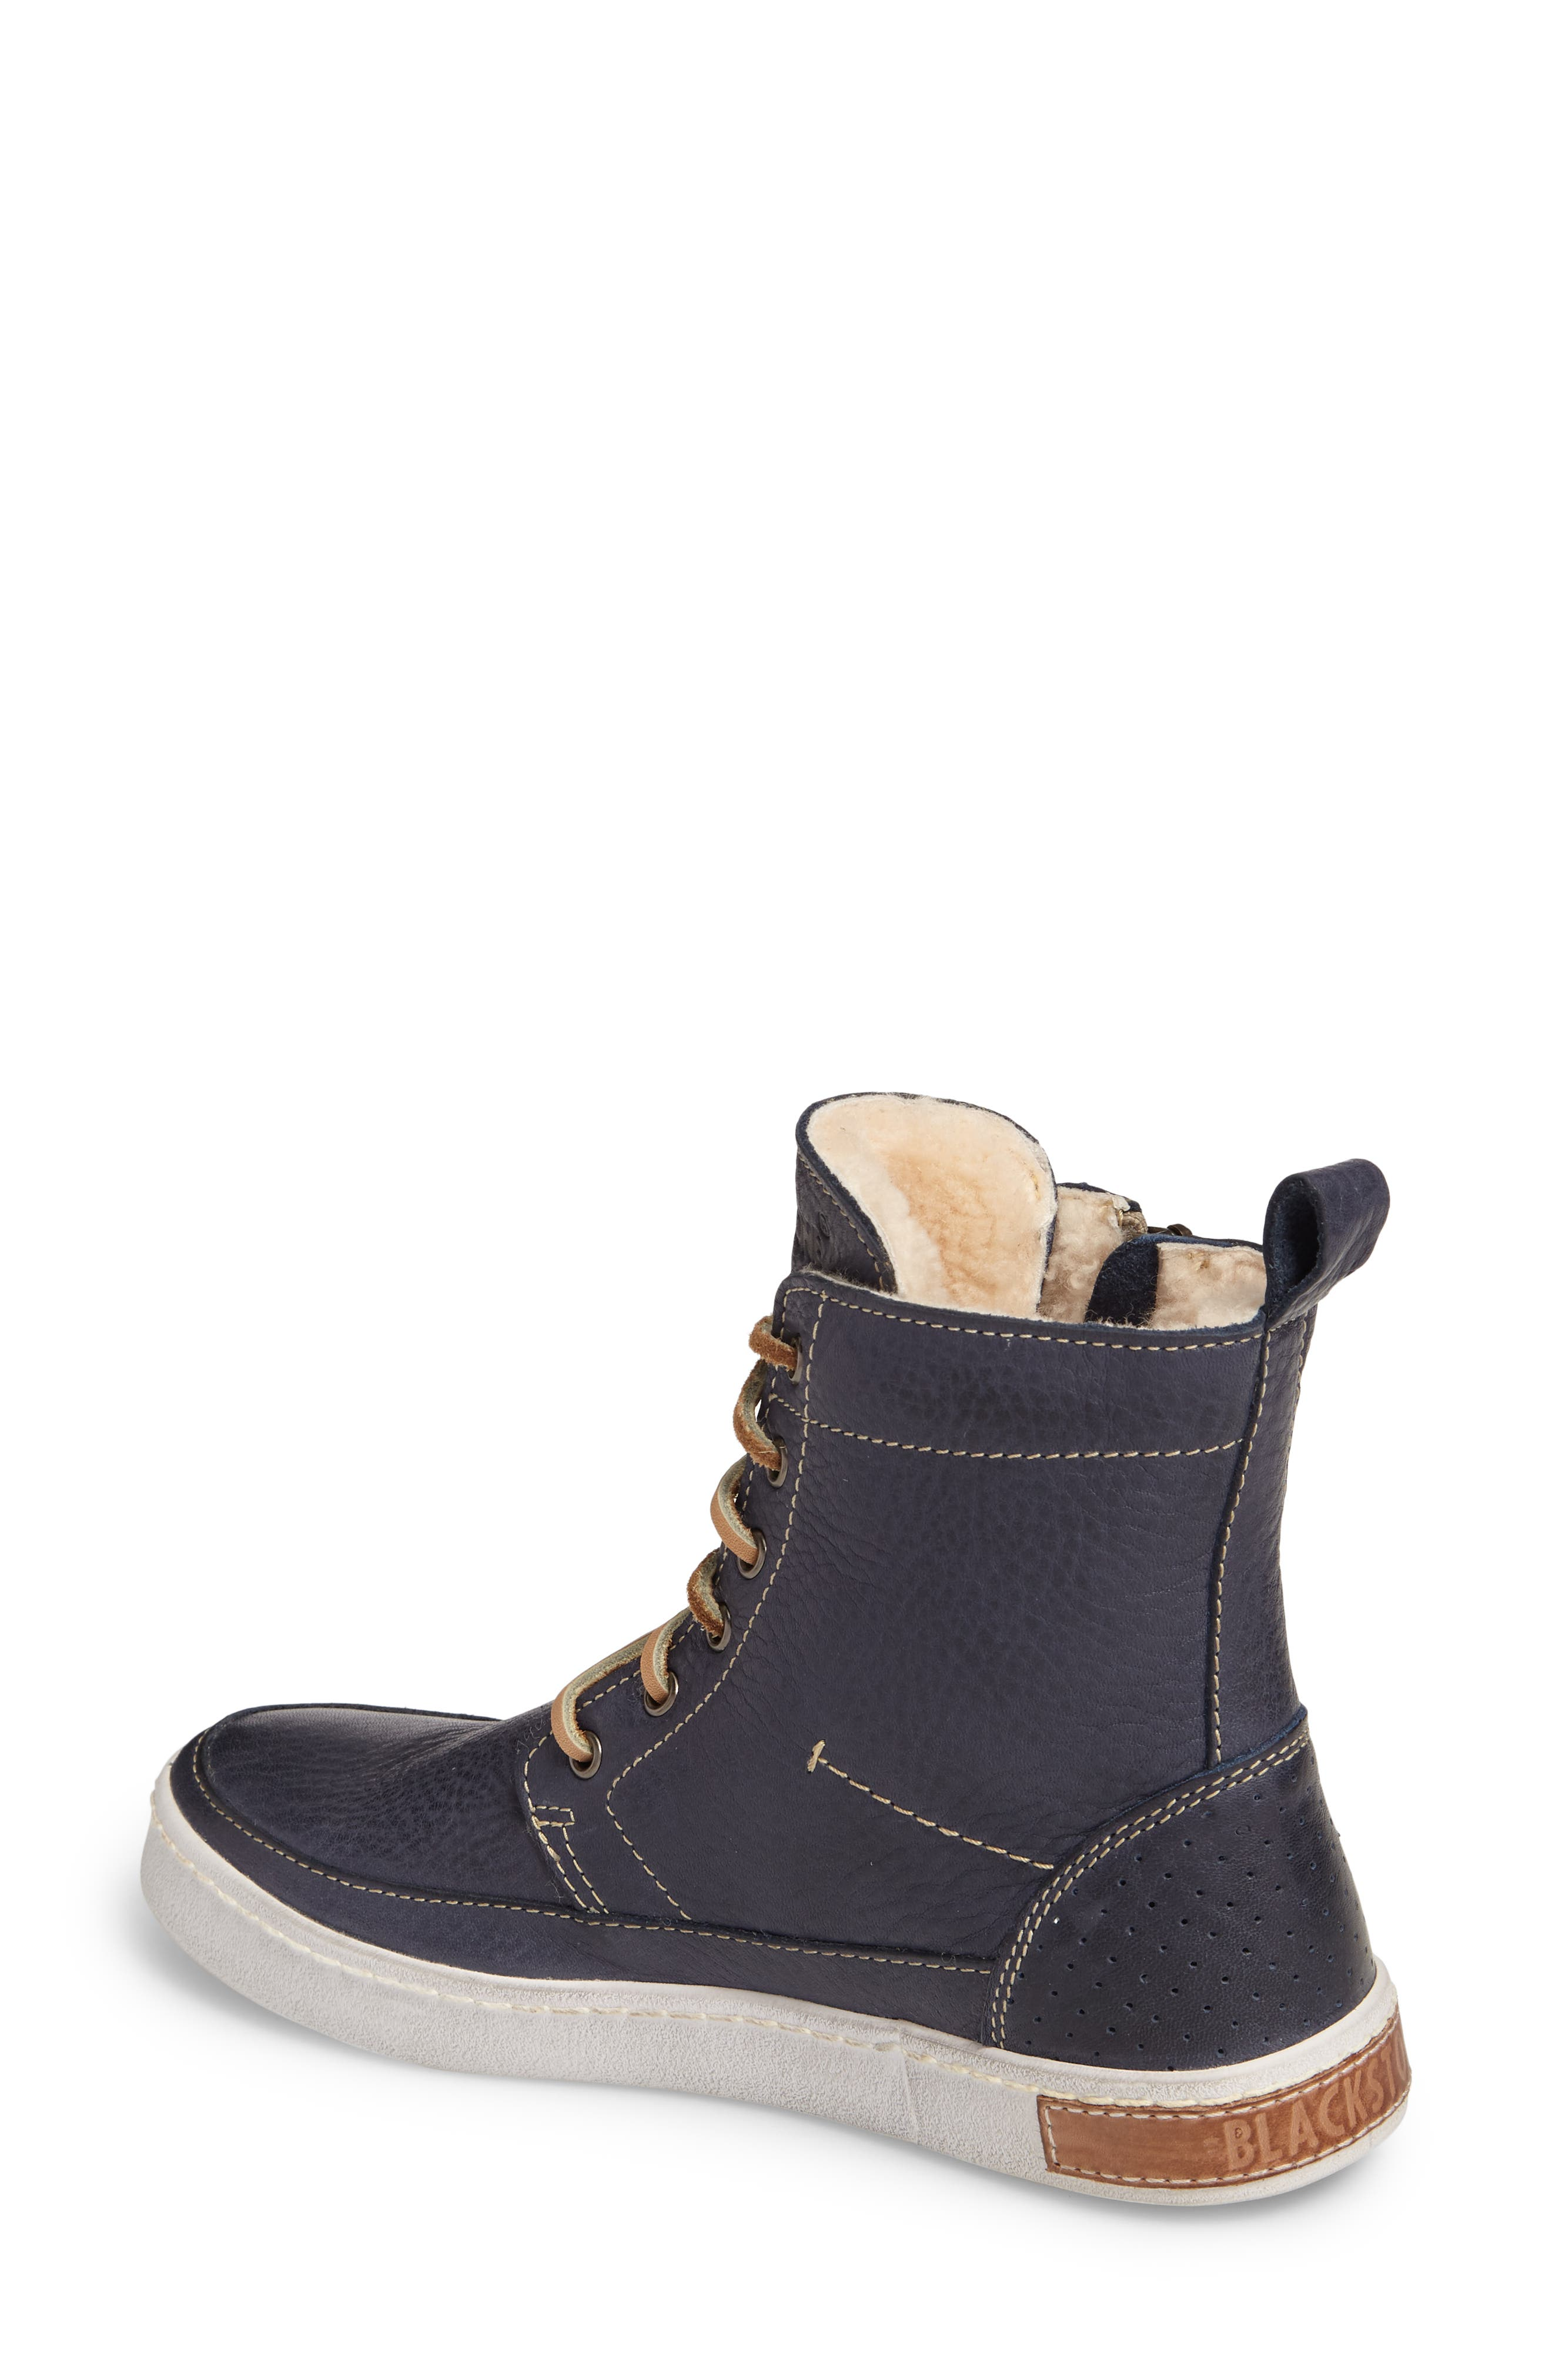 Alternate Image 2  - Blackstone 'CW96' Genuine Shearling Lined Sneaker Boot (Women)